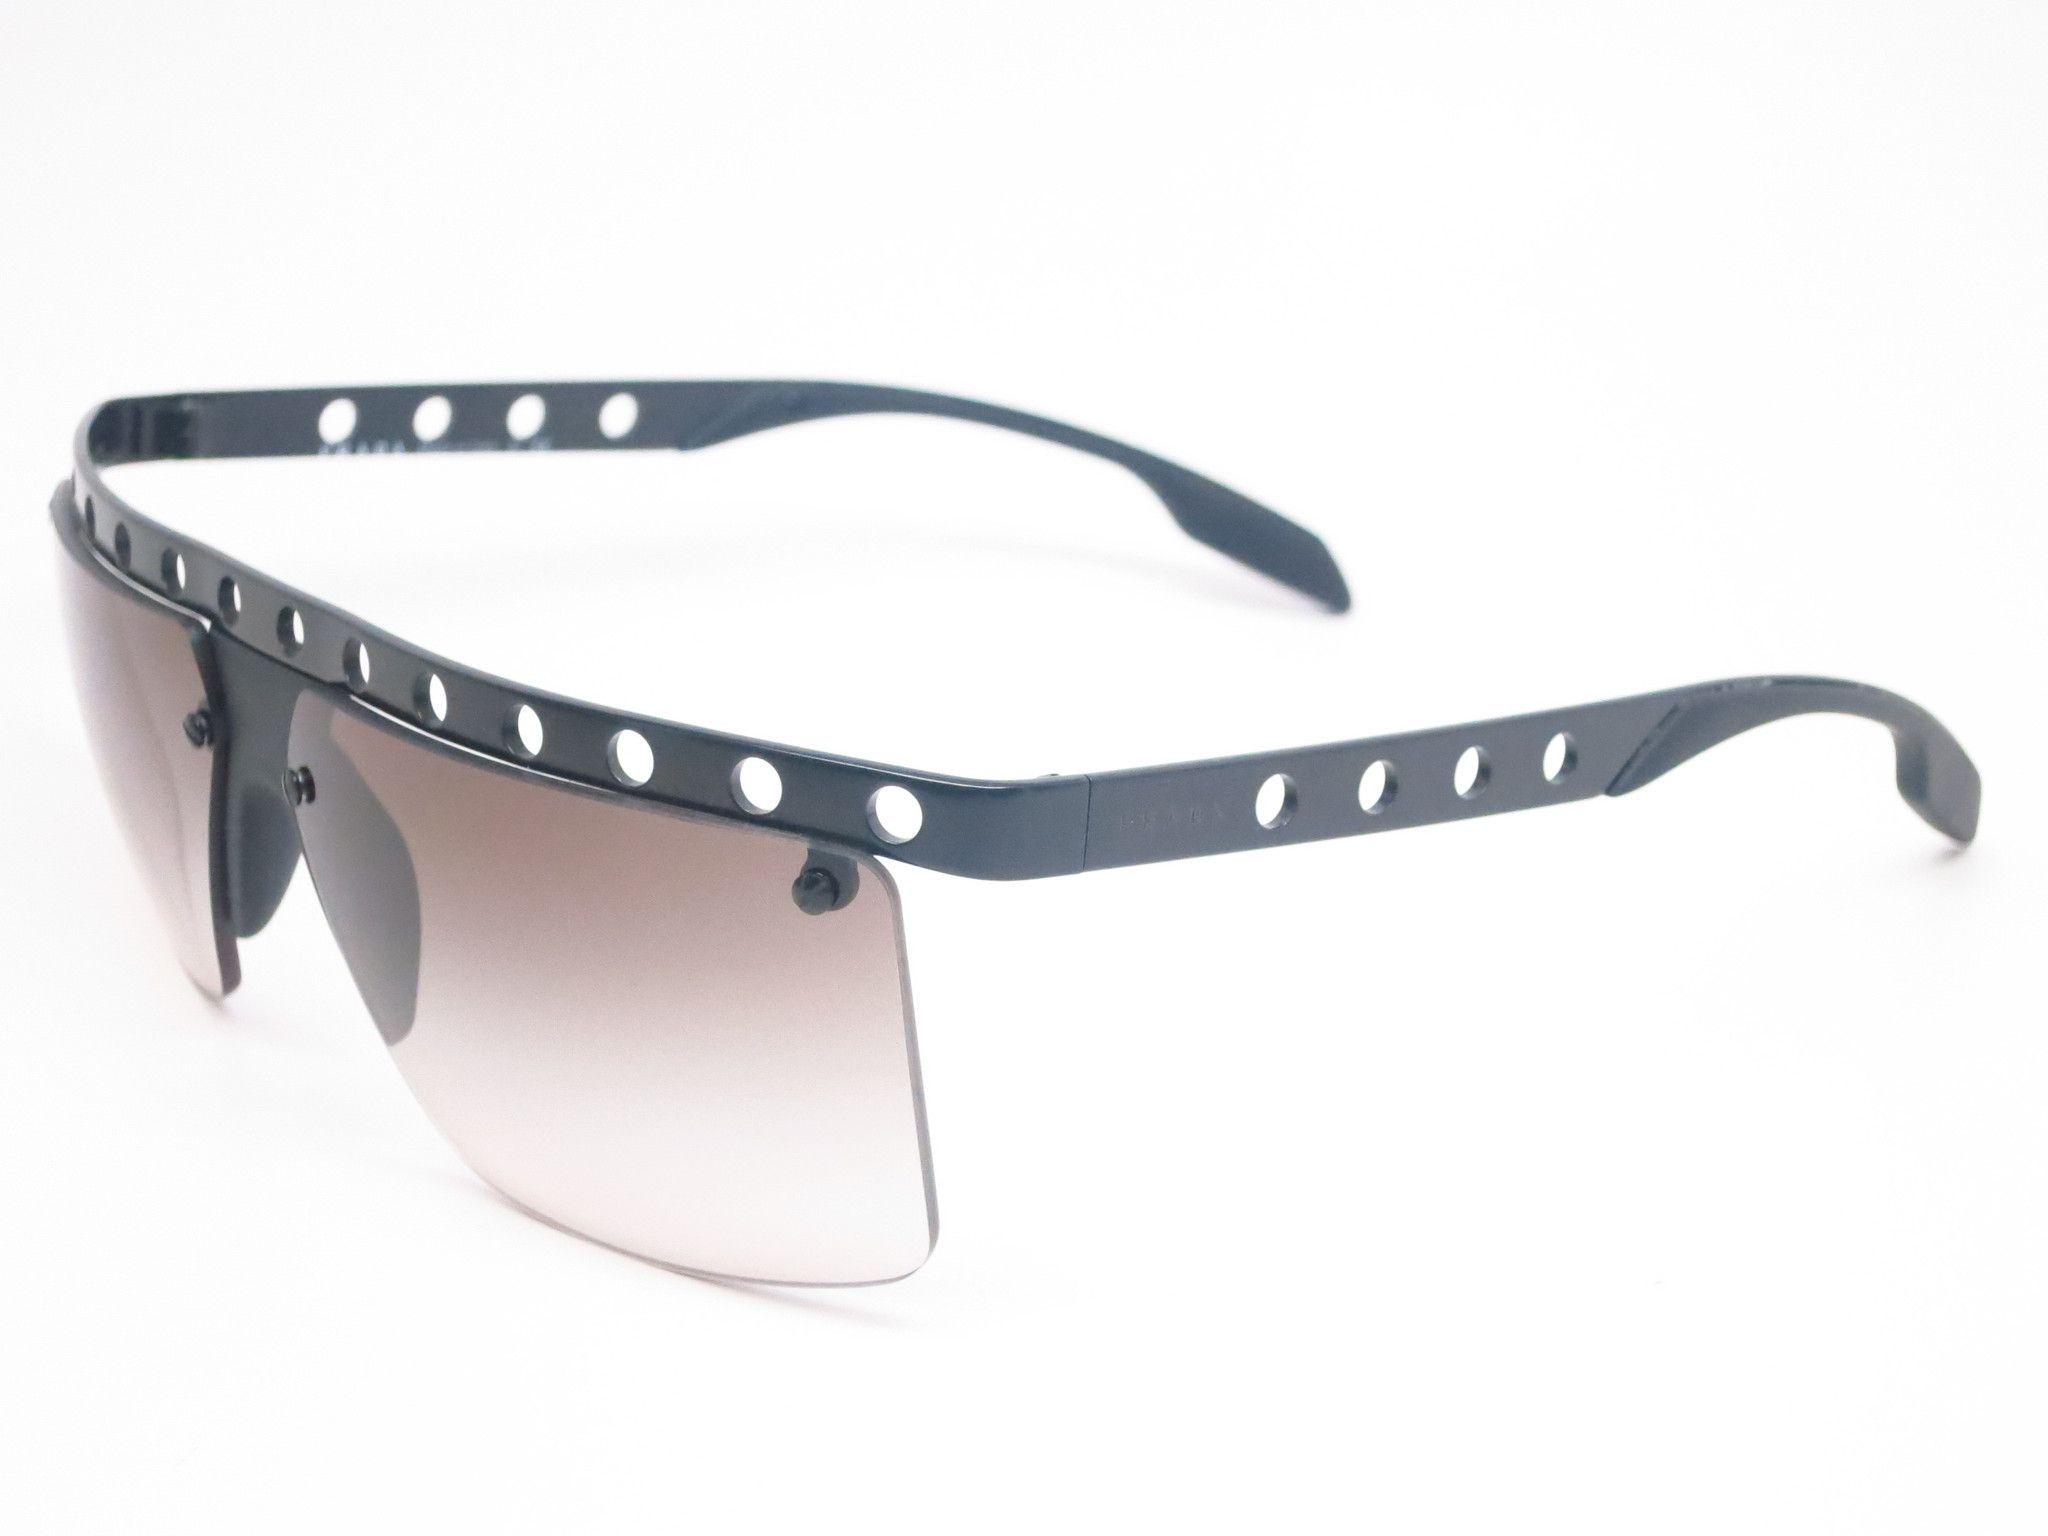 c34dc0d62358 ... wholesale prada spr 50r 1bo 0a7 black sunglasses 75f86 5a8ad